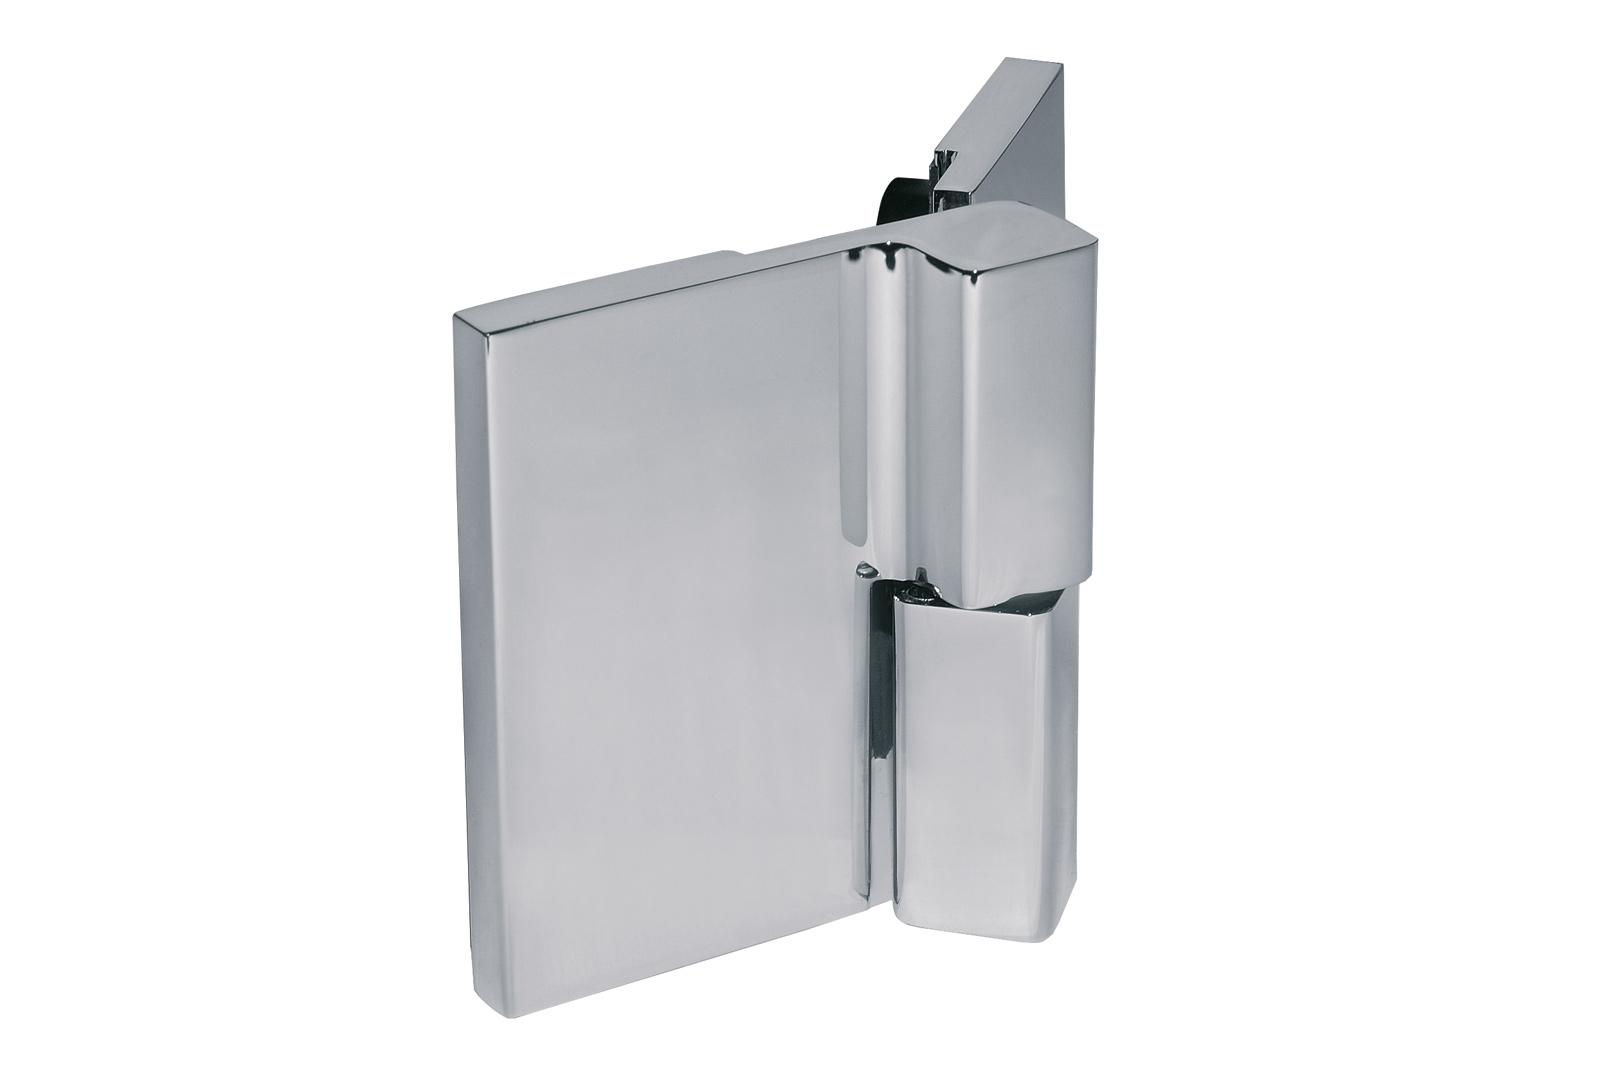 beschl ge glas rapp duschkabinen glast ren glasvord cher fenster haust ren uvm. Black Bedroom Furniture Sets. Home Design Ideas